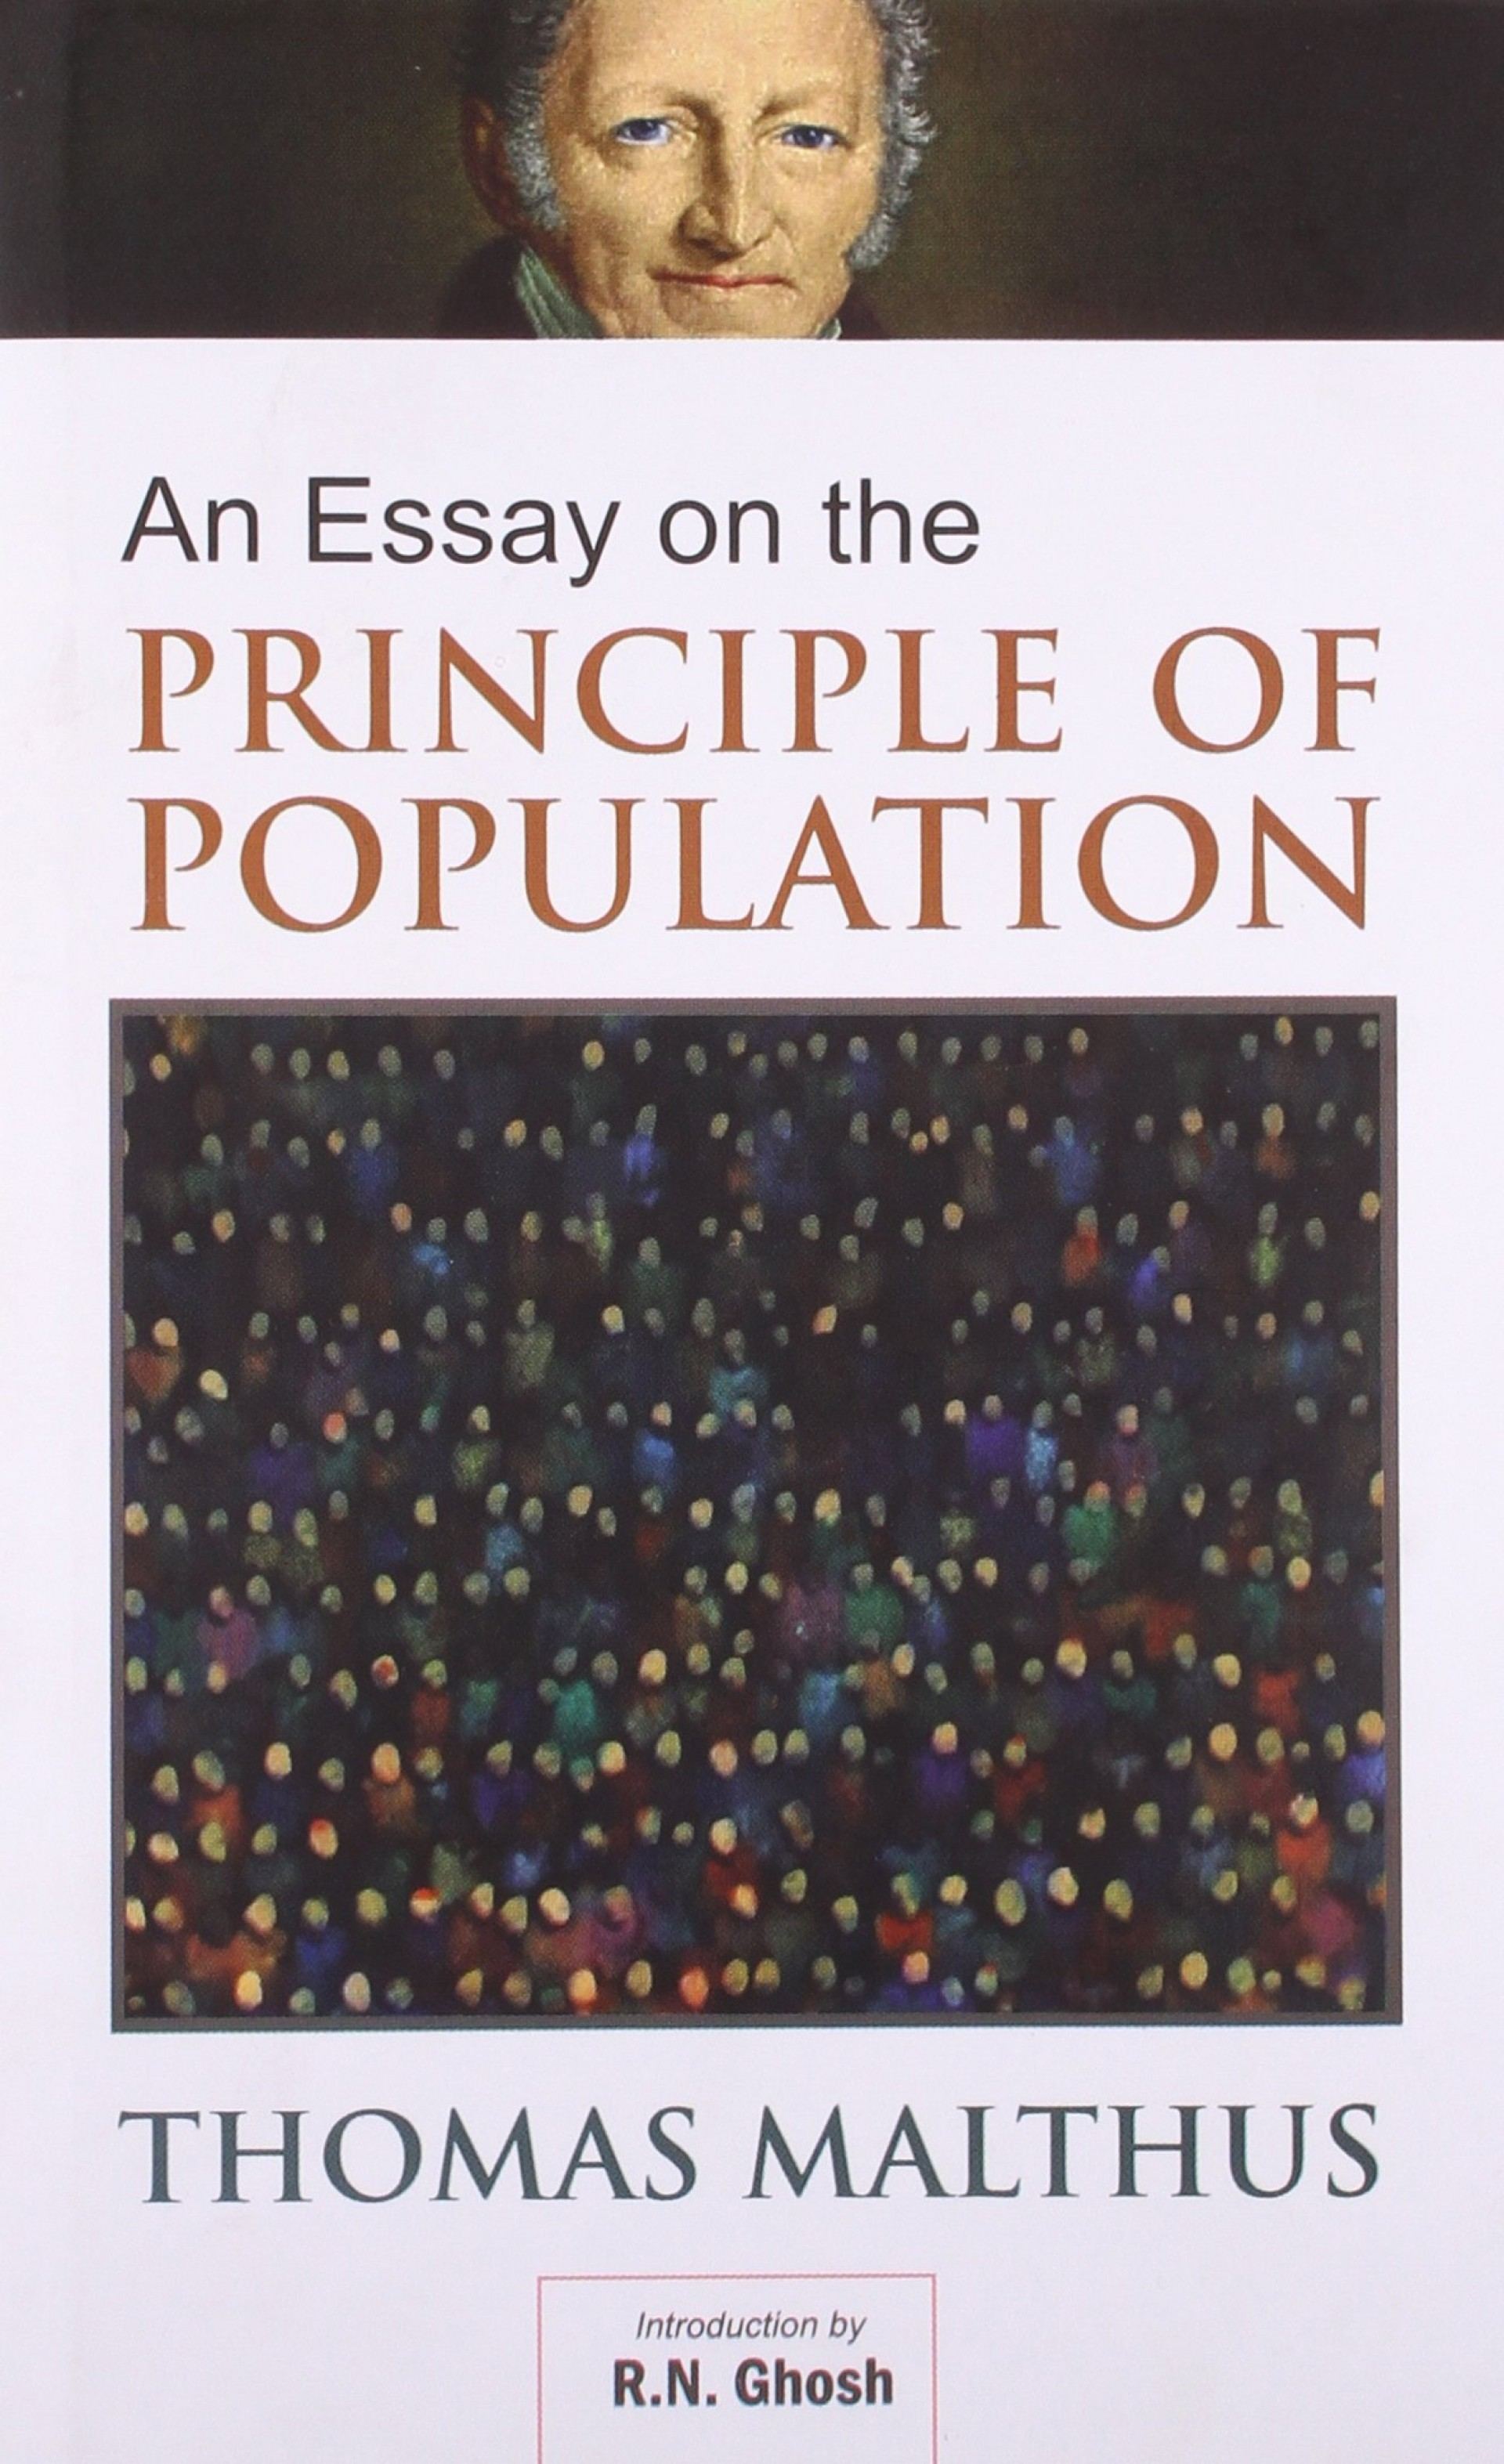 006 Essay On The Principle Of Population 8162bfm1ycfl Singular Pdf By Thomas Malthus Main Idea 1920